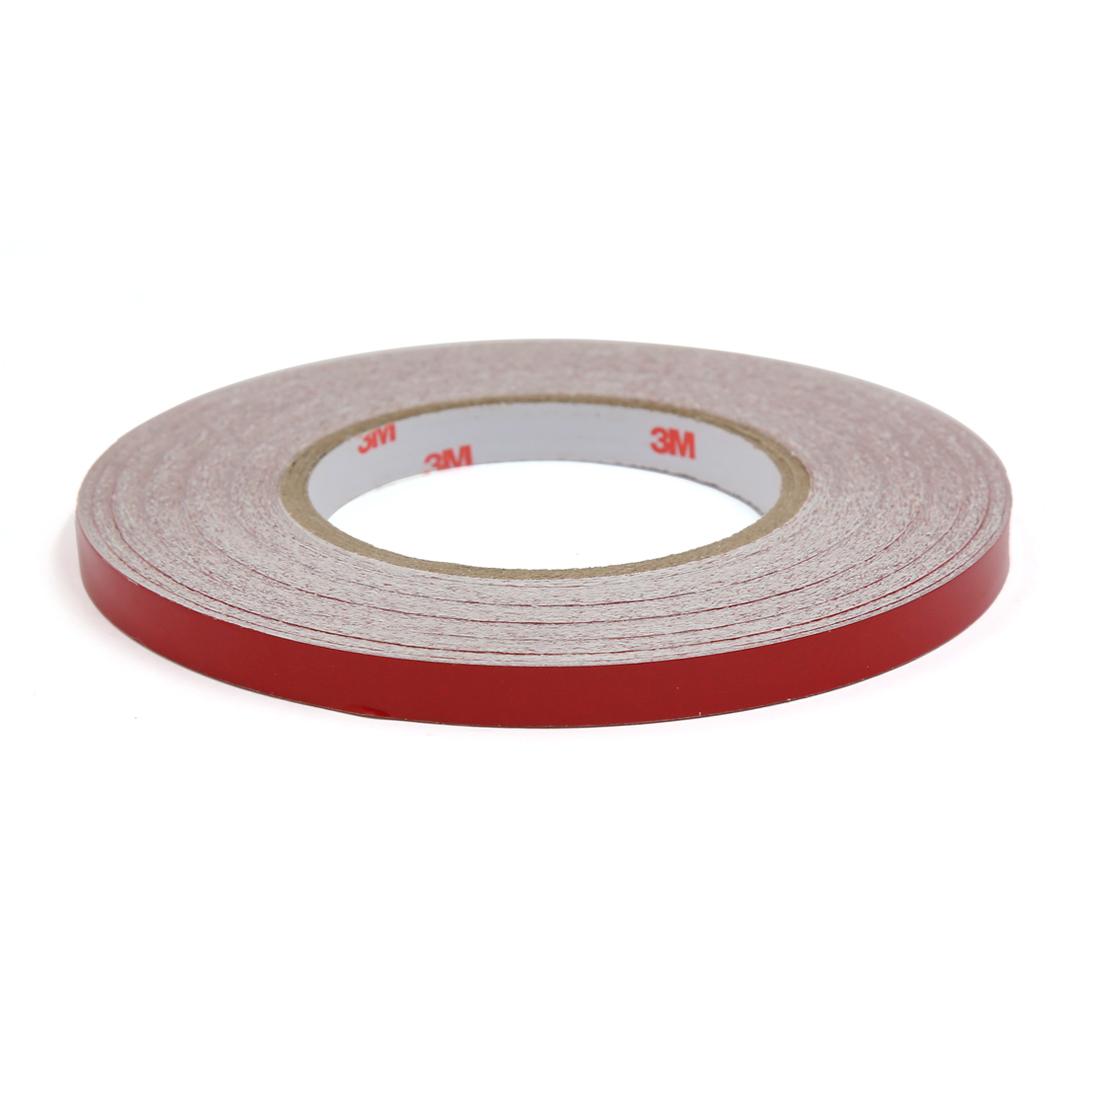 46M Adhesive Luminous Line Sticker Decor Reflective Tape Stripe for Vehicle Car